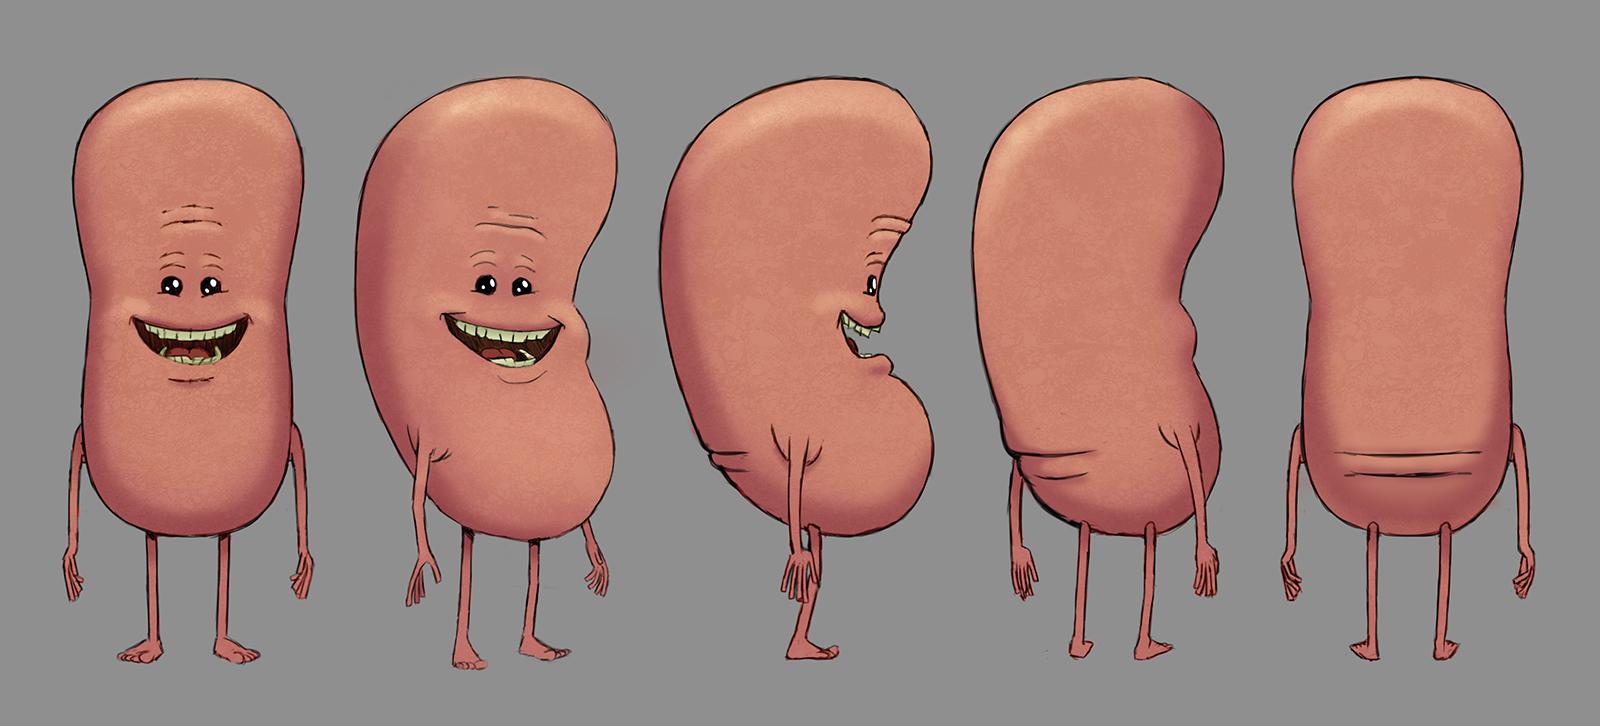 Kidney Turnaround